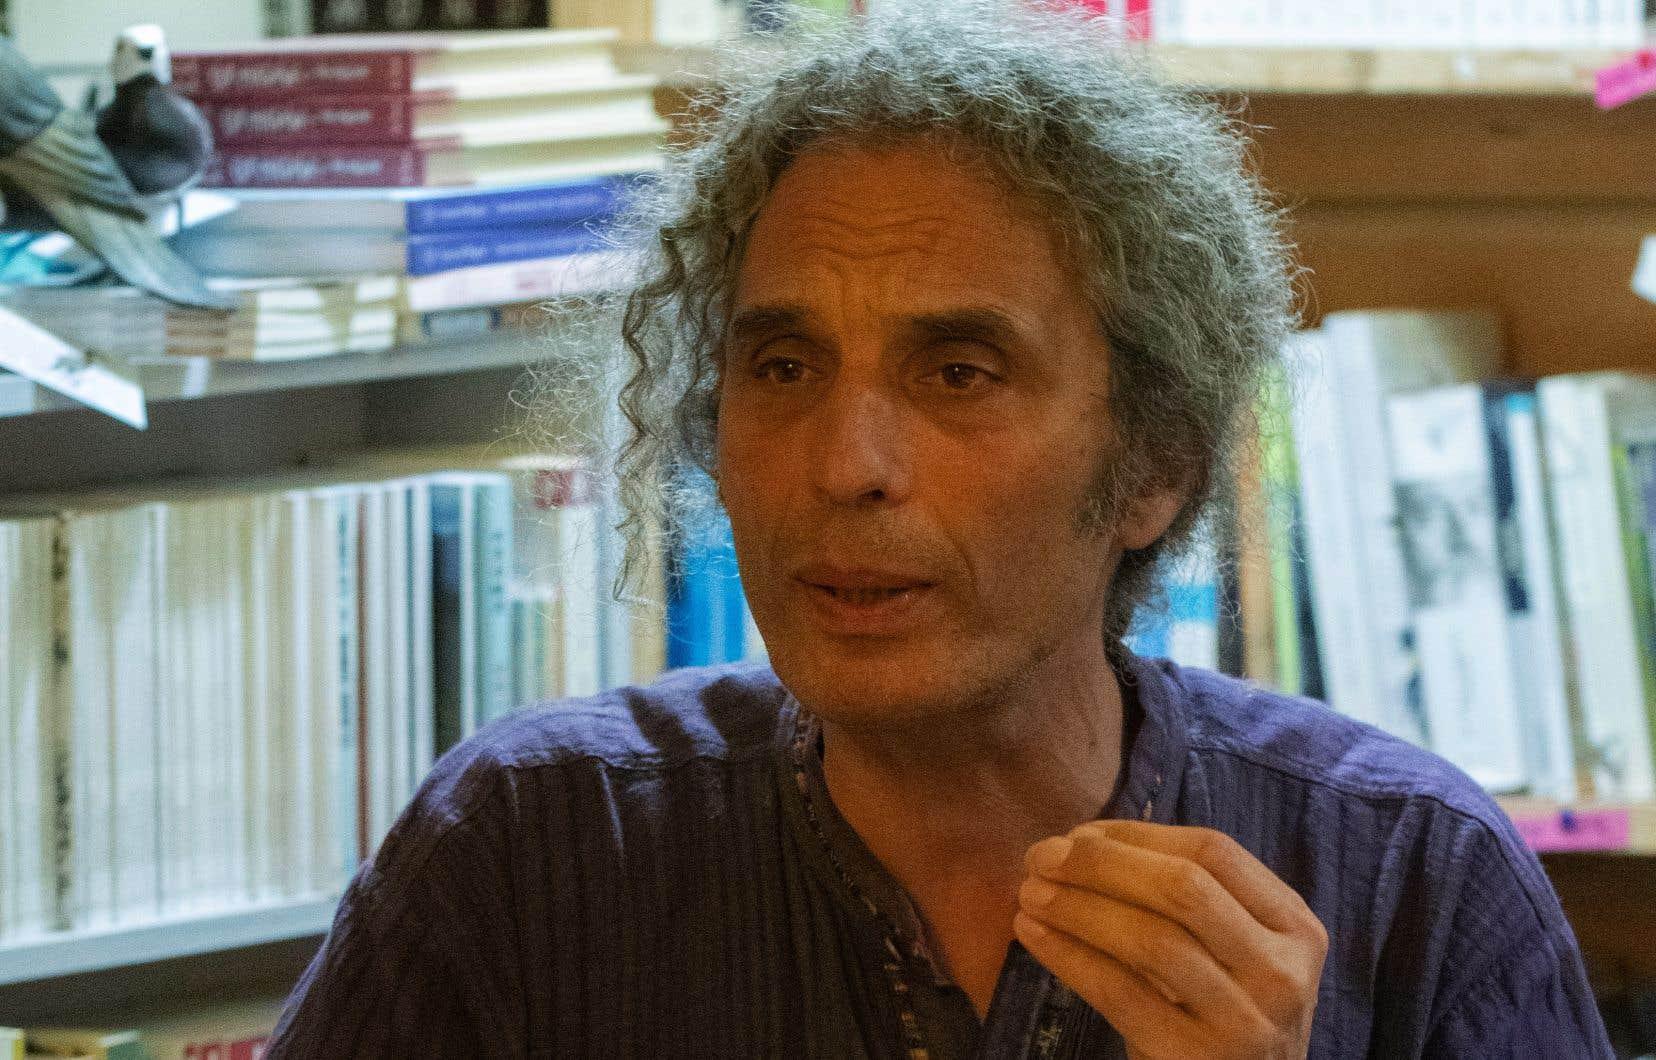 Hervé Krief fournit un condensé percutant, qui prend la mesure de la démesure de l'omniprésence de la technologie.